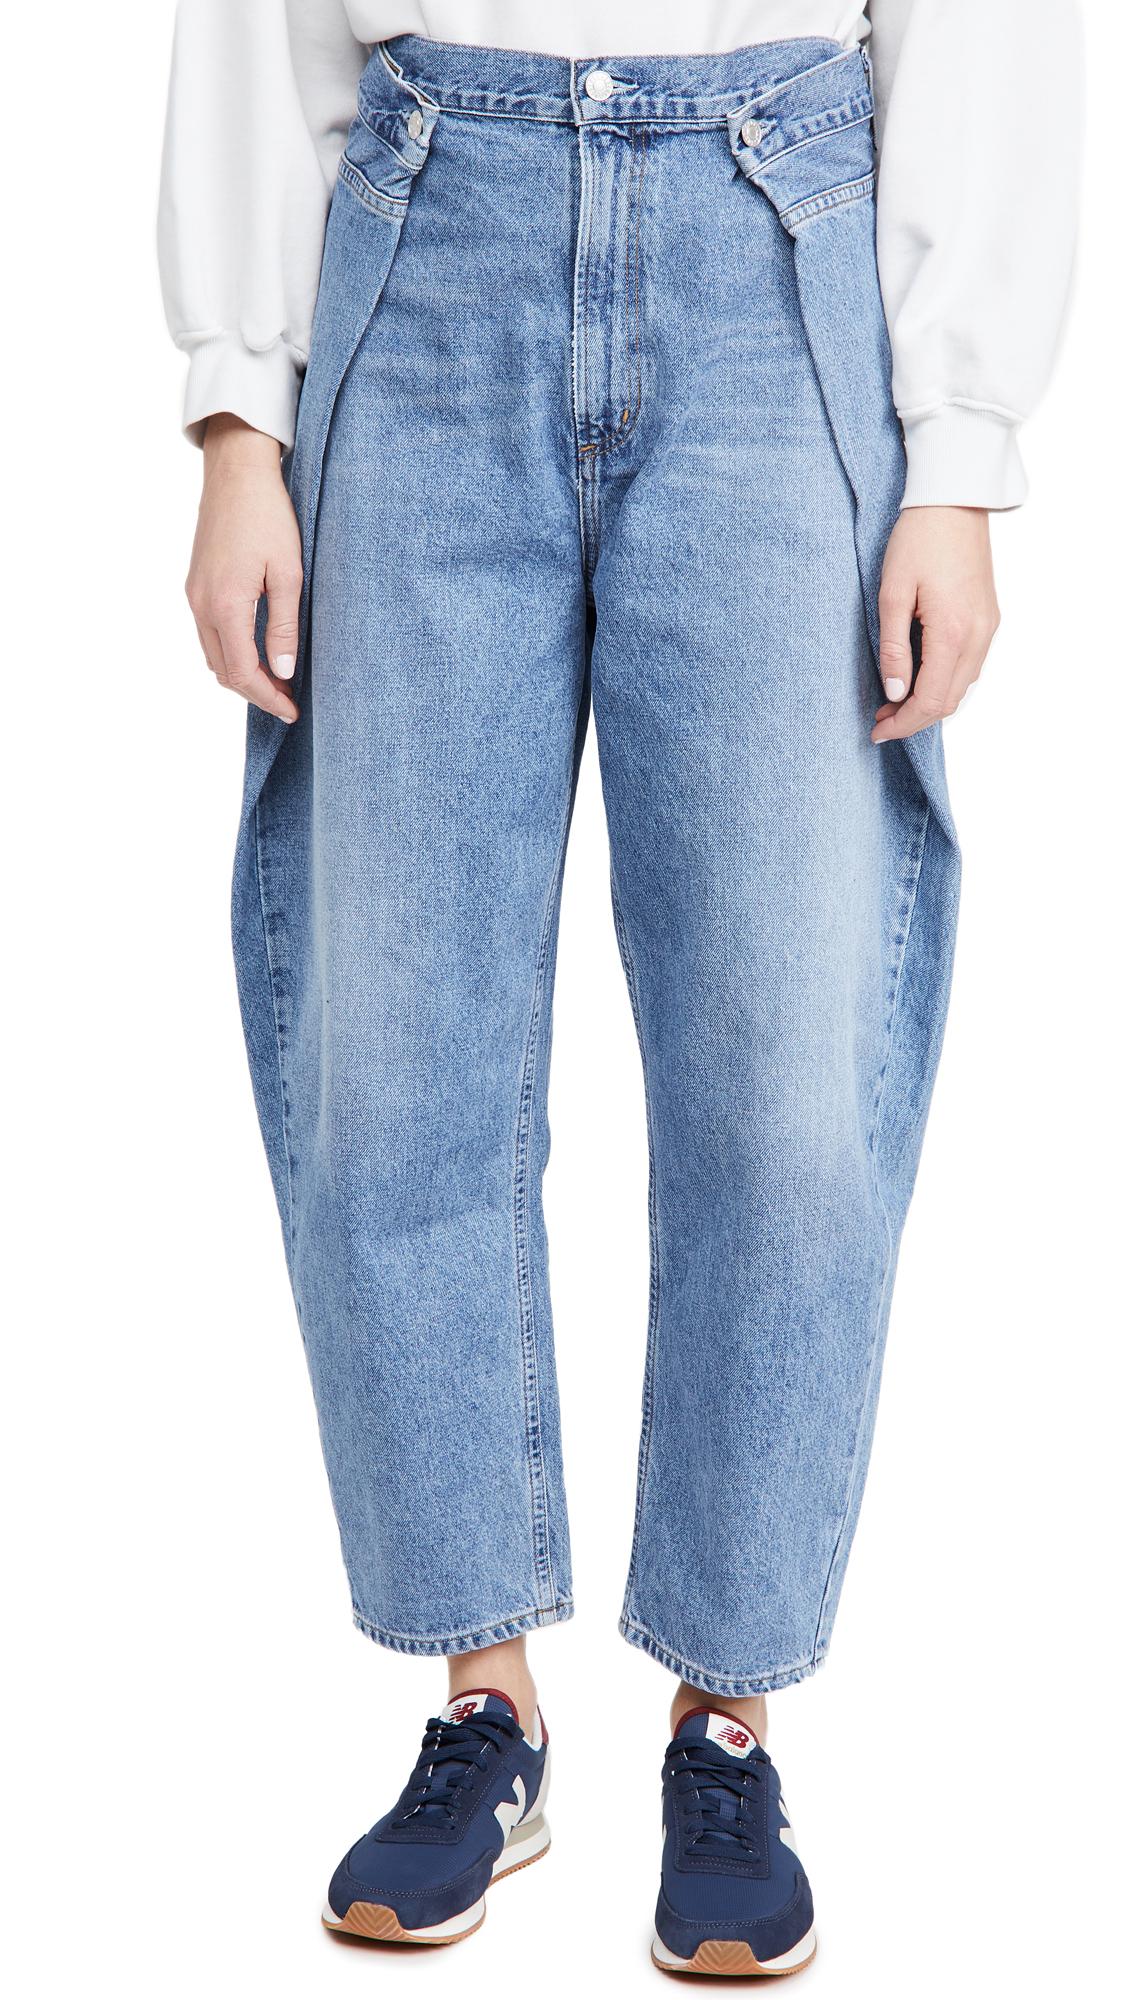 AGOLDE Fold Jeans